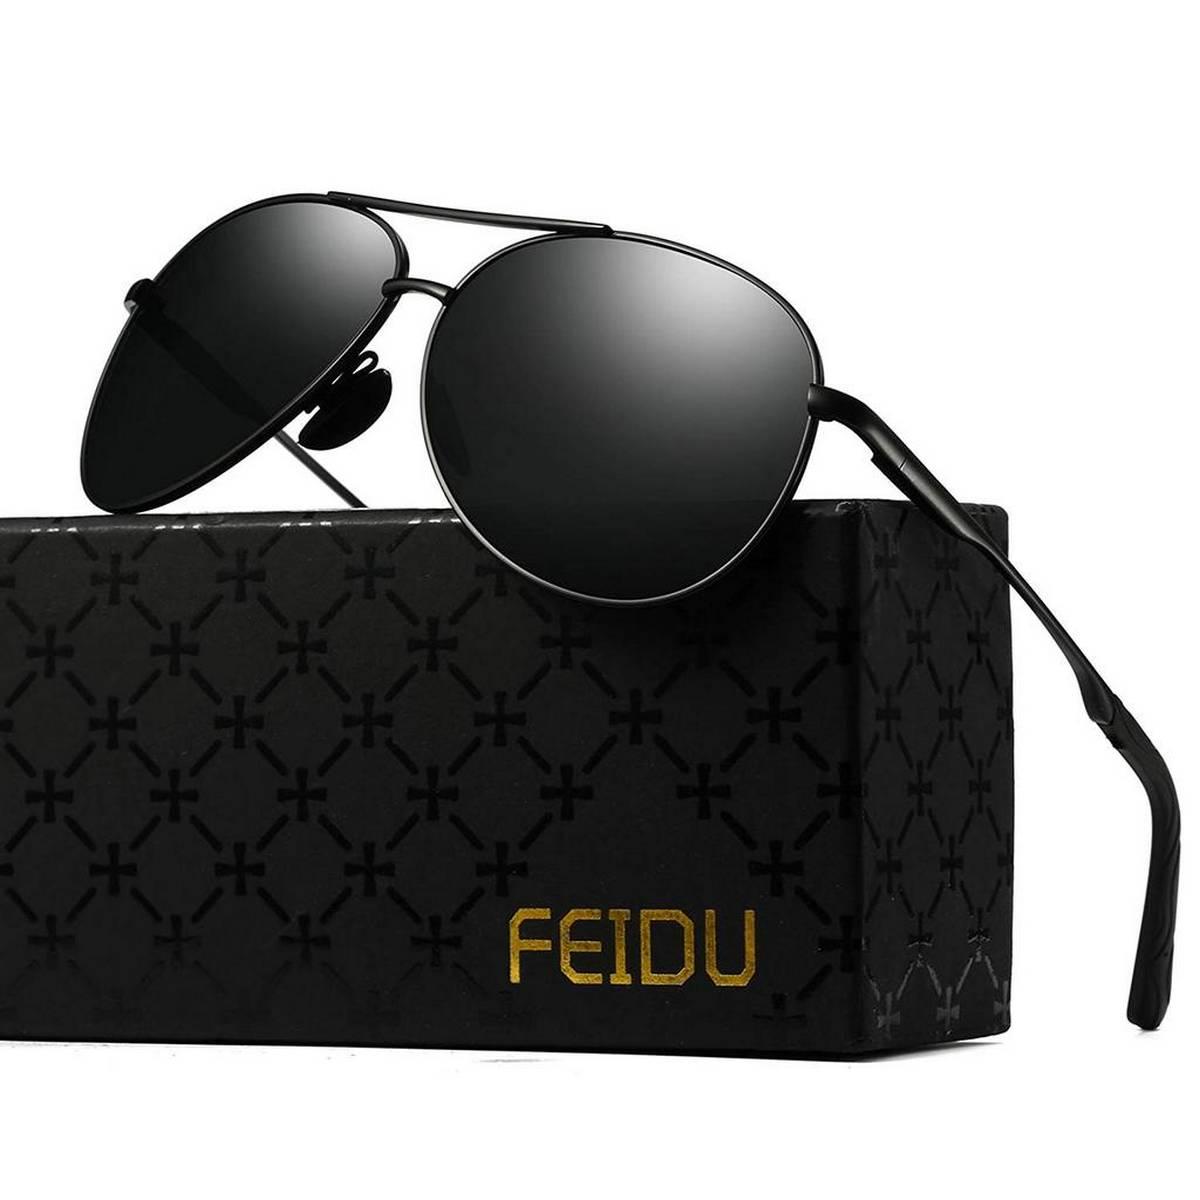 American Style Black Aviator Sunglasses For Men